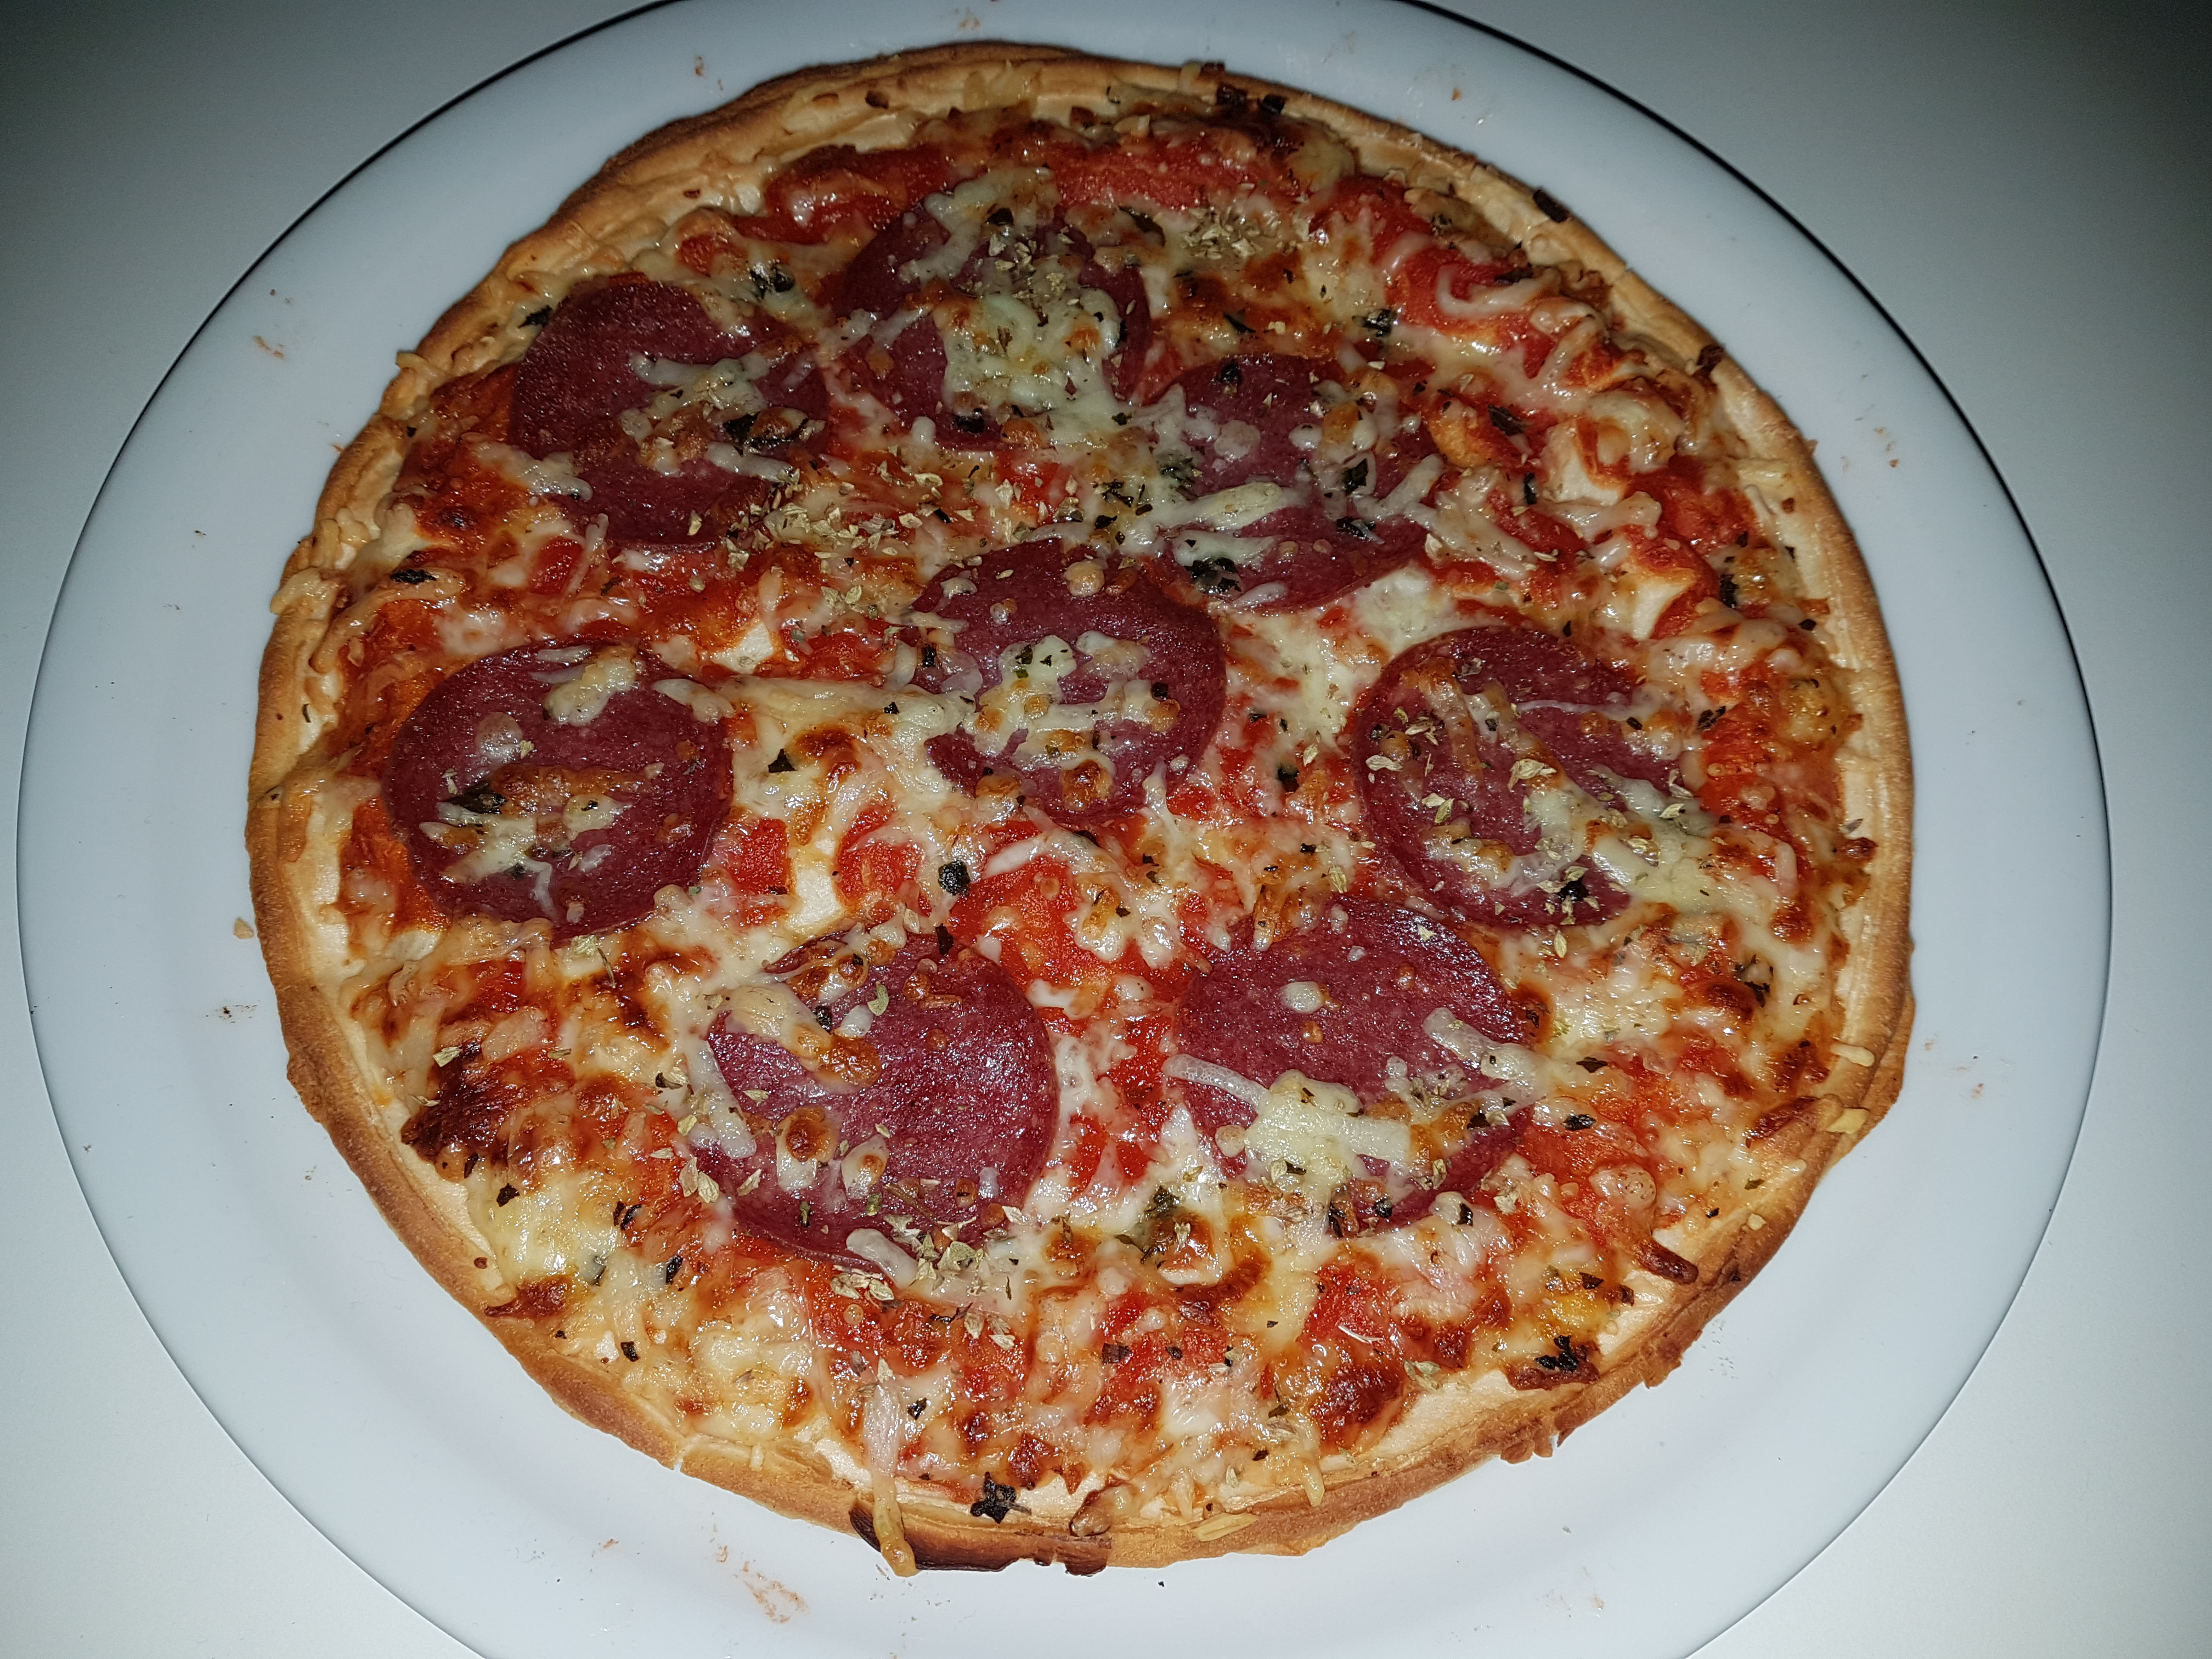 http://foodloader.net/Holz_2018-08-29_Pizza.jpg